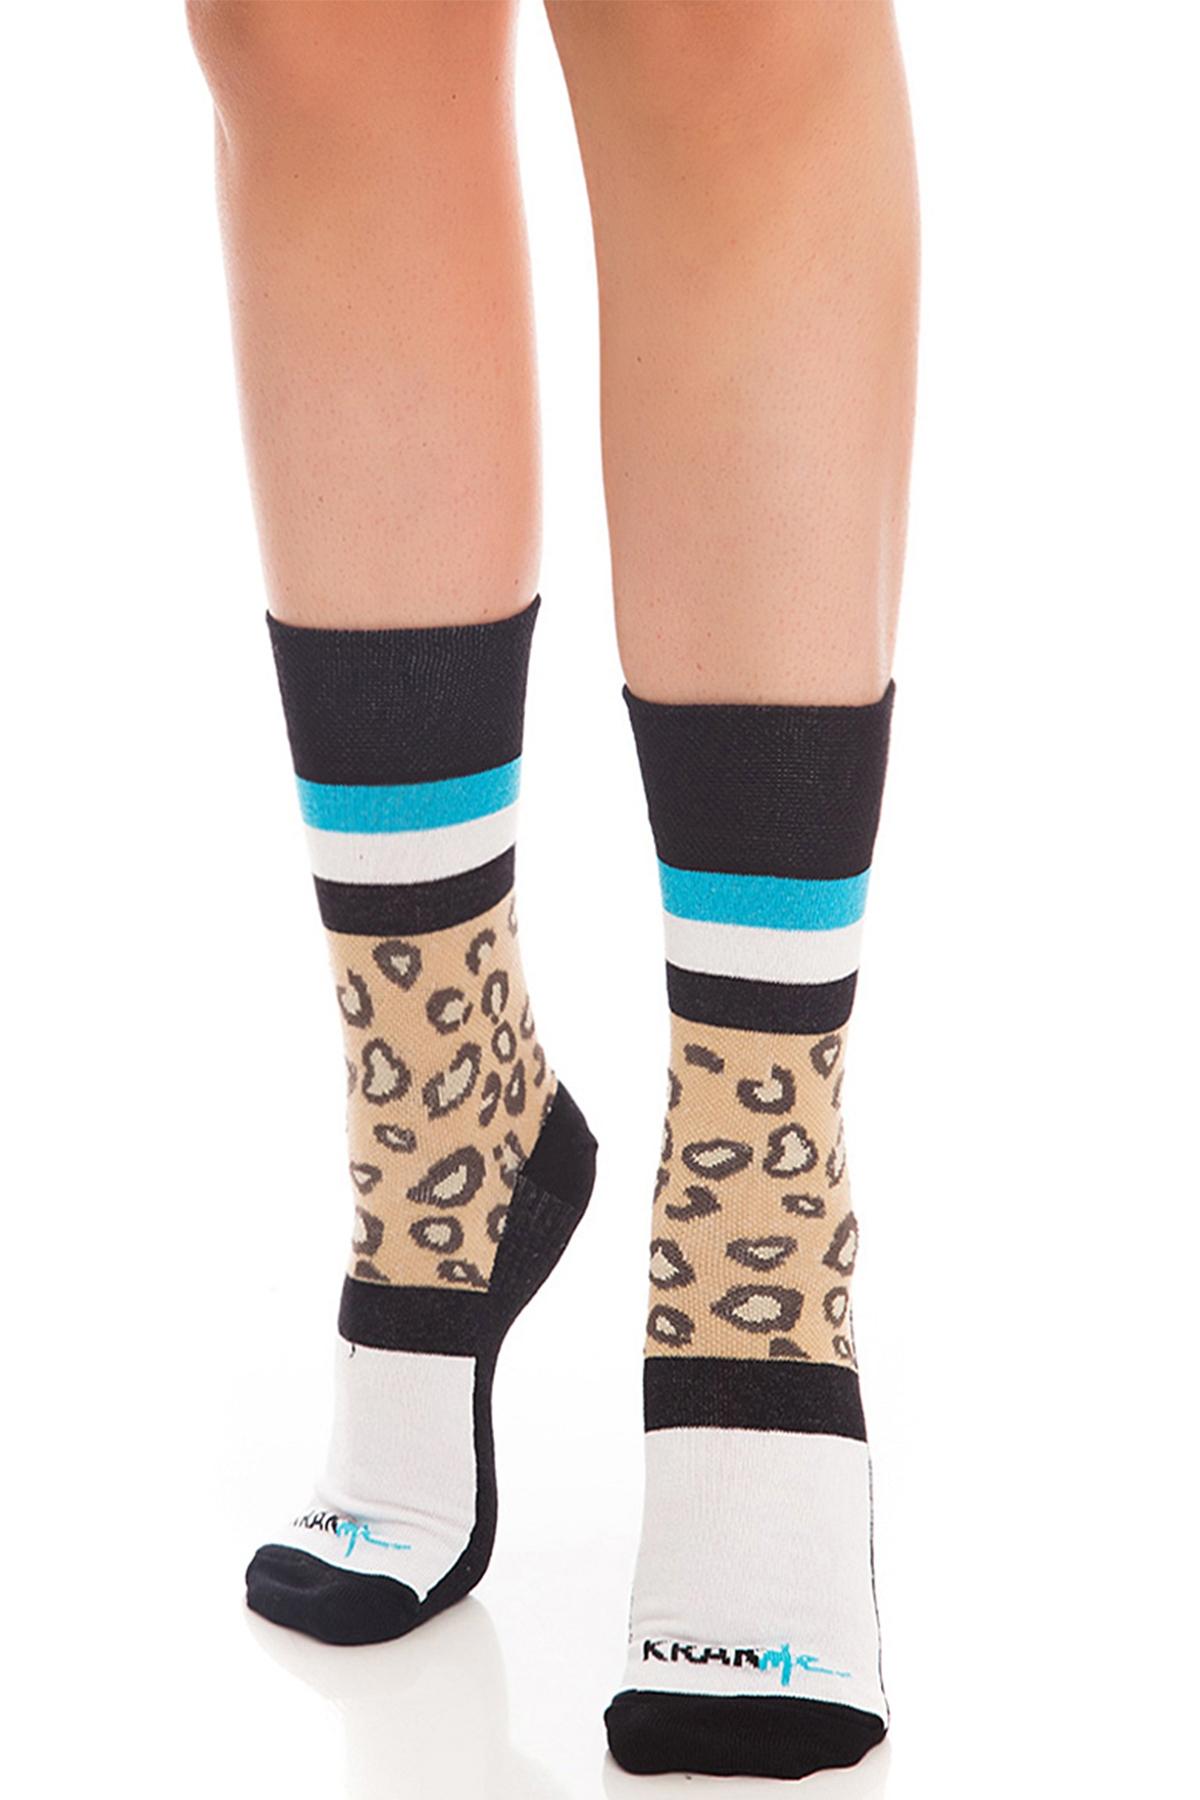 Дамски чорапи The Leo Ankle Short / Krak me